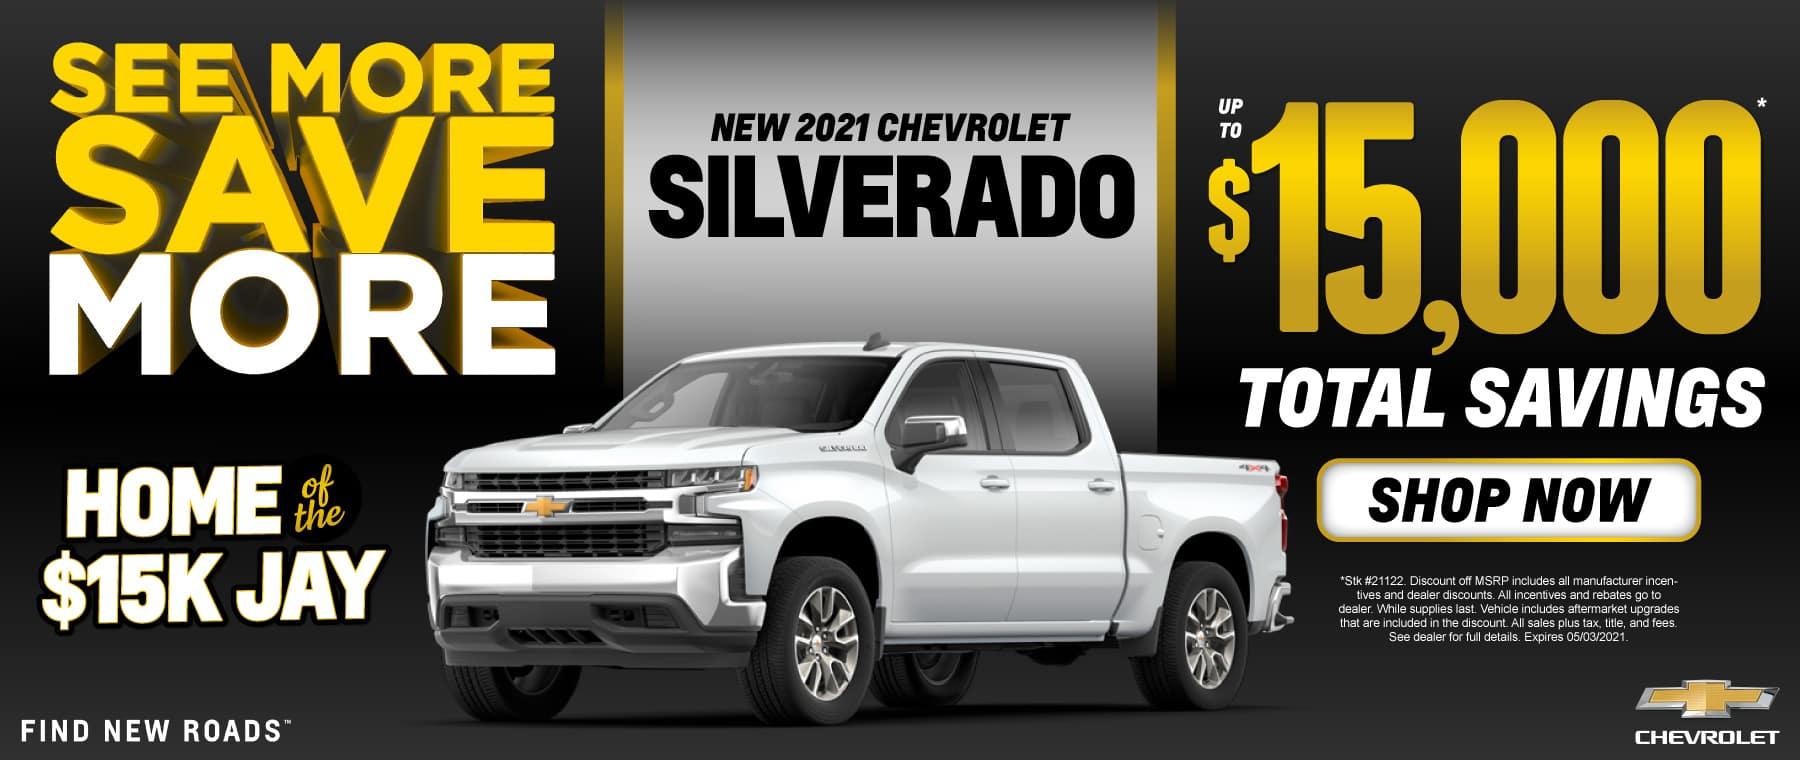 New 2021 Chevy Silverado - $15,000 Total Savings - Shop Now